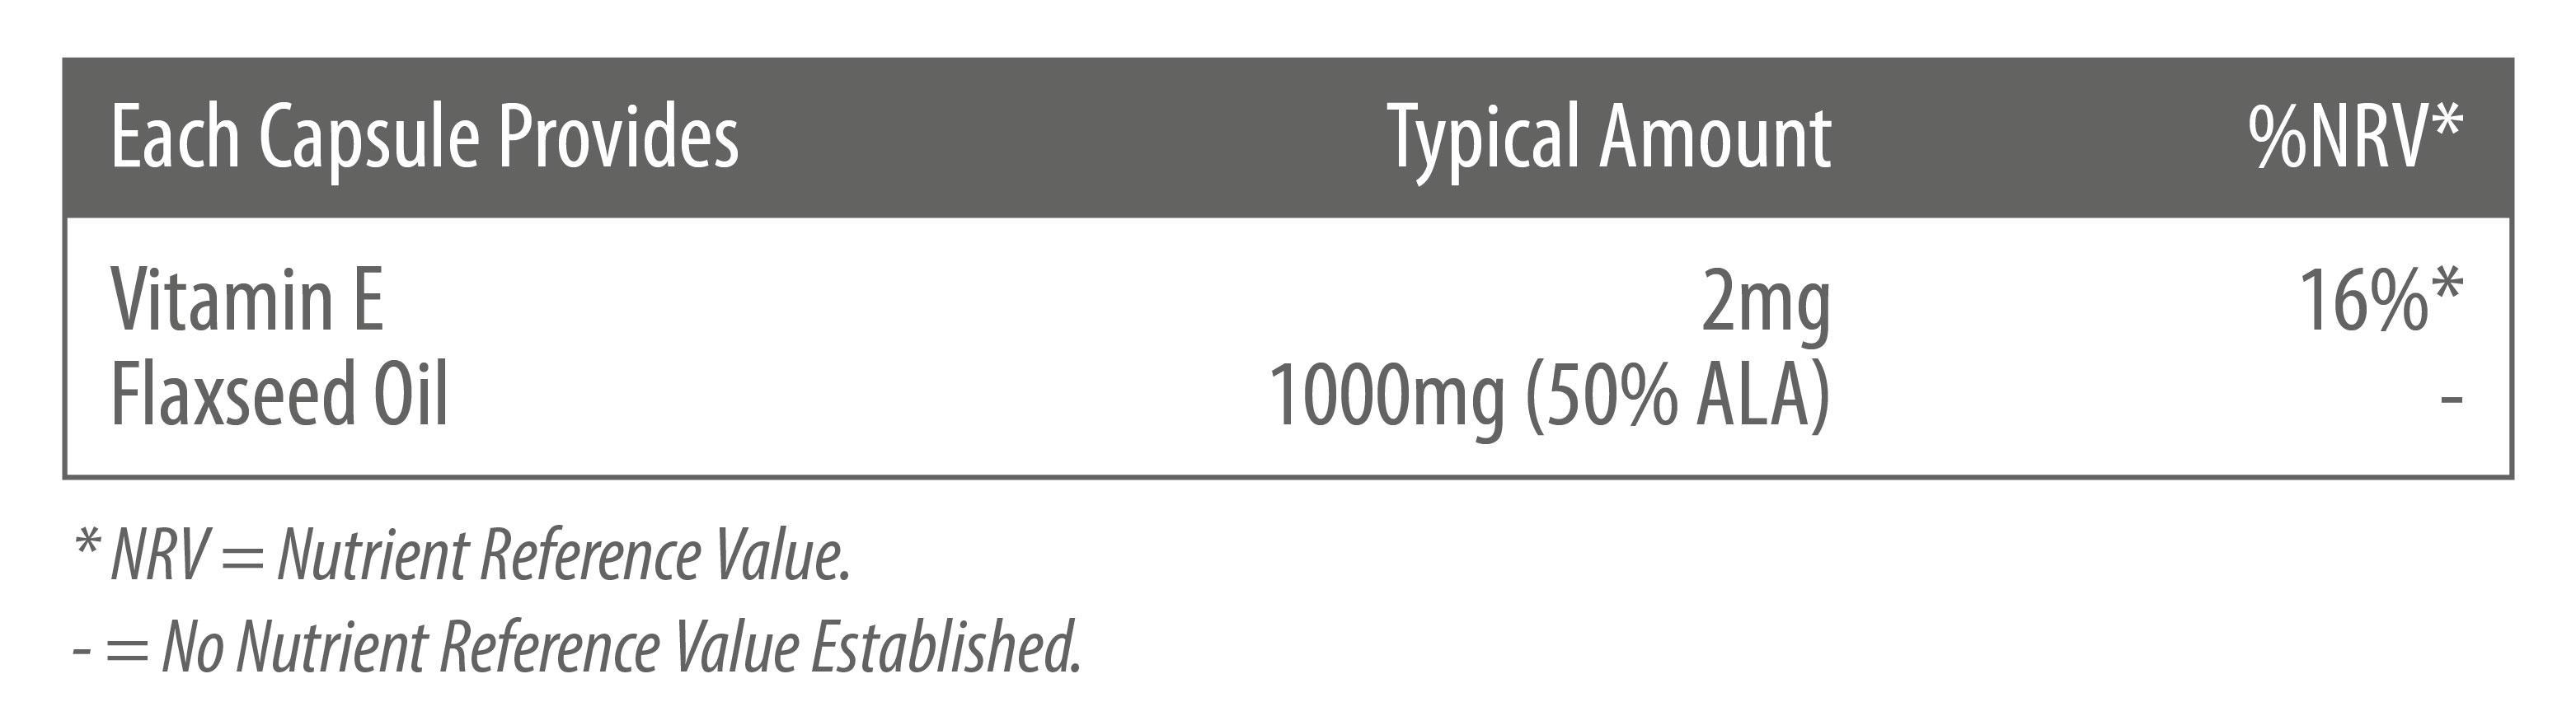 nrv-flaxseed-01.jpg